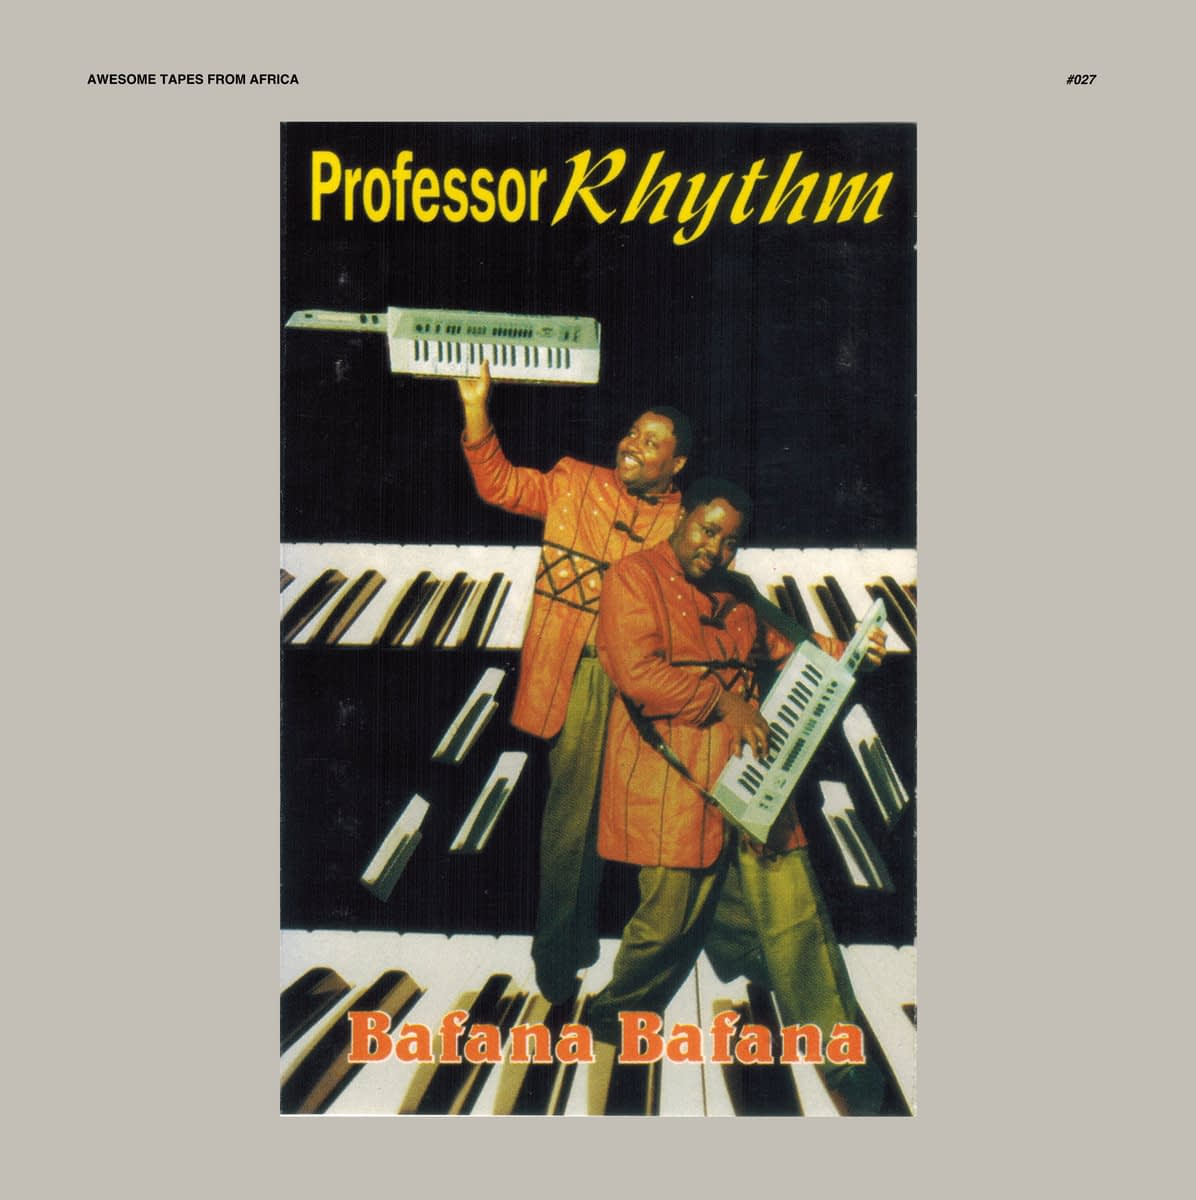 "Awesome Tapes From Africa издаст редкую квайто жемчужину Professor Rhythm ""Bafana Bafana"""